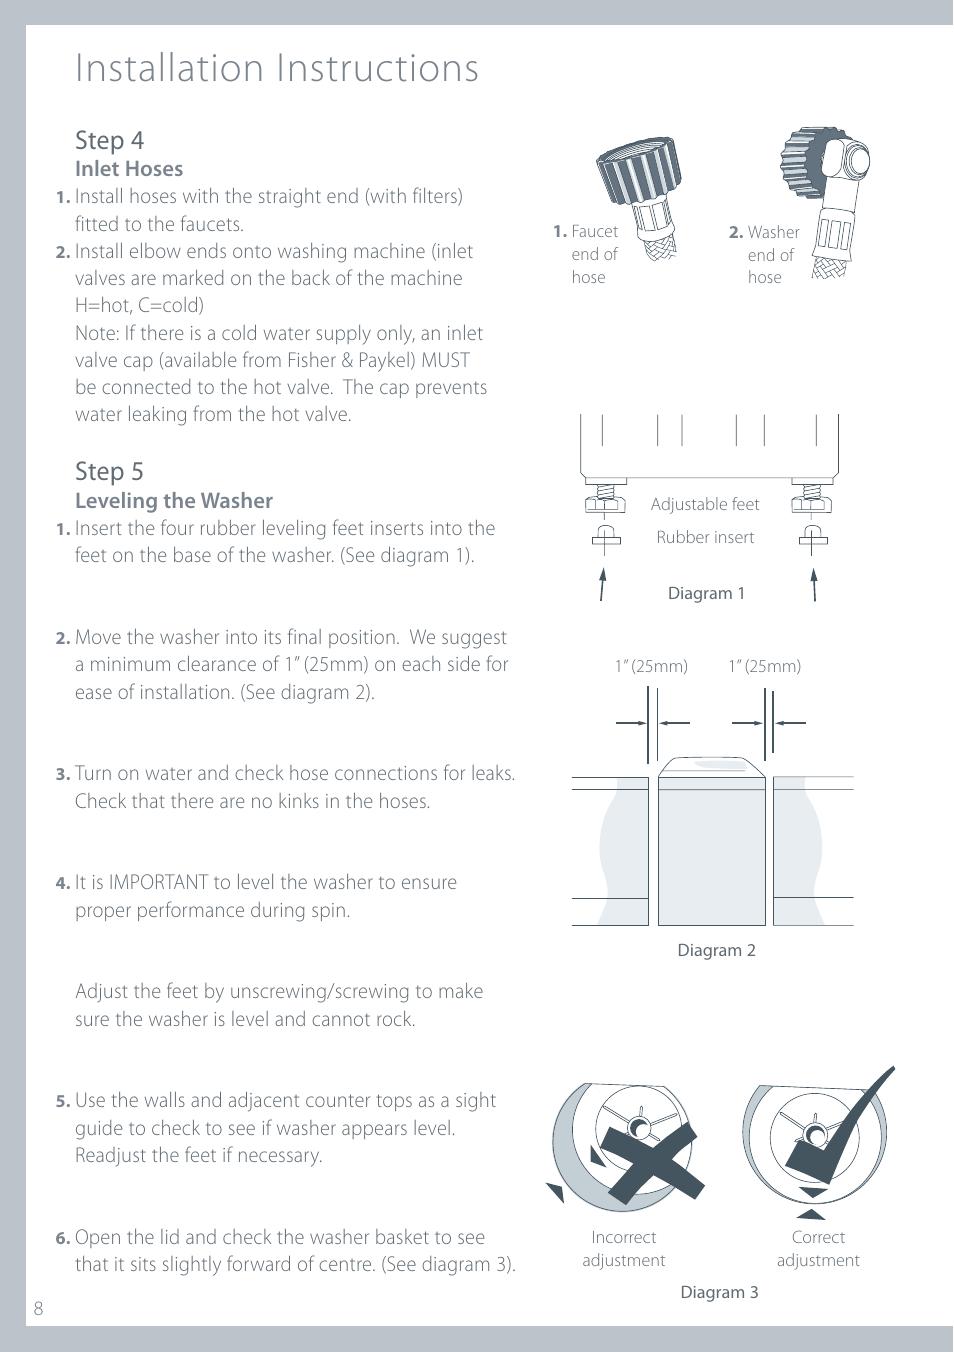 medium resolution of installation instructions step 4 step 5 fisher paykel iwl12 manuel d utilisation page 8 80